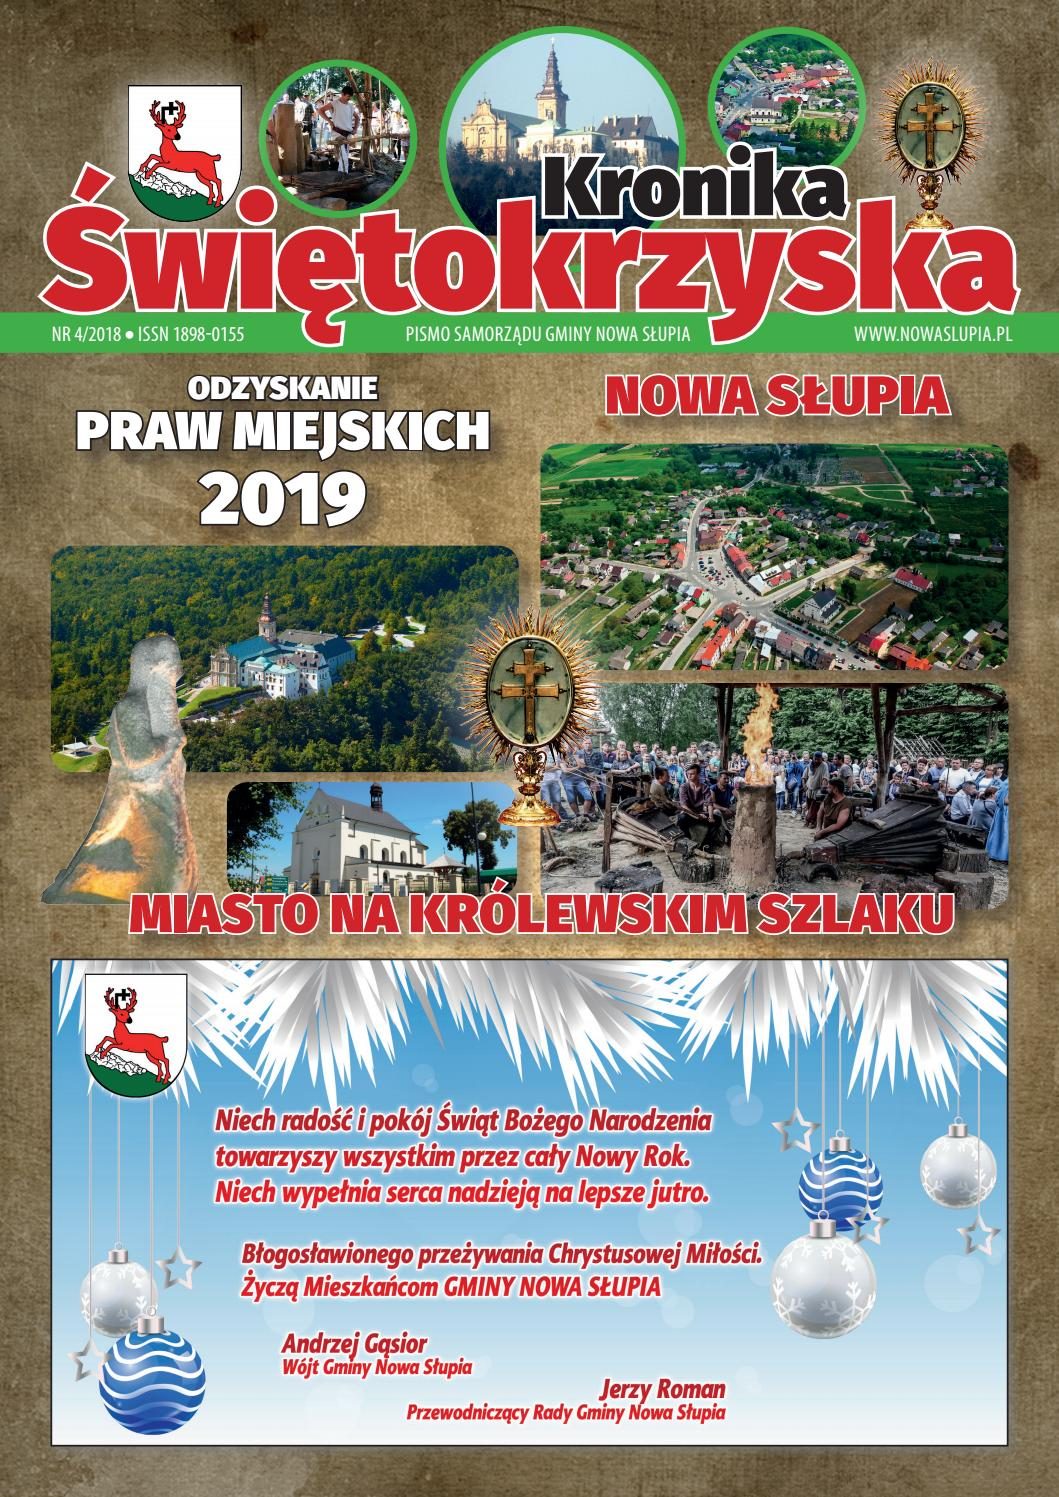 Kalendarium Burmistrza - Miasto i Gmina Nowa Supia